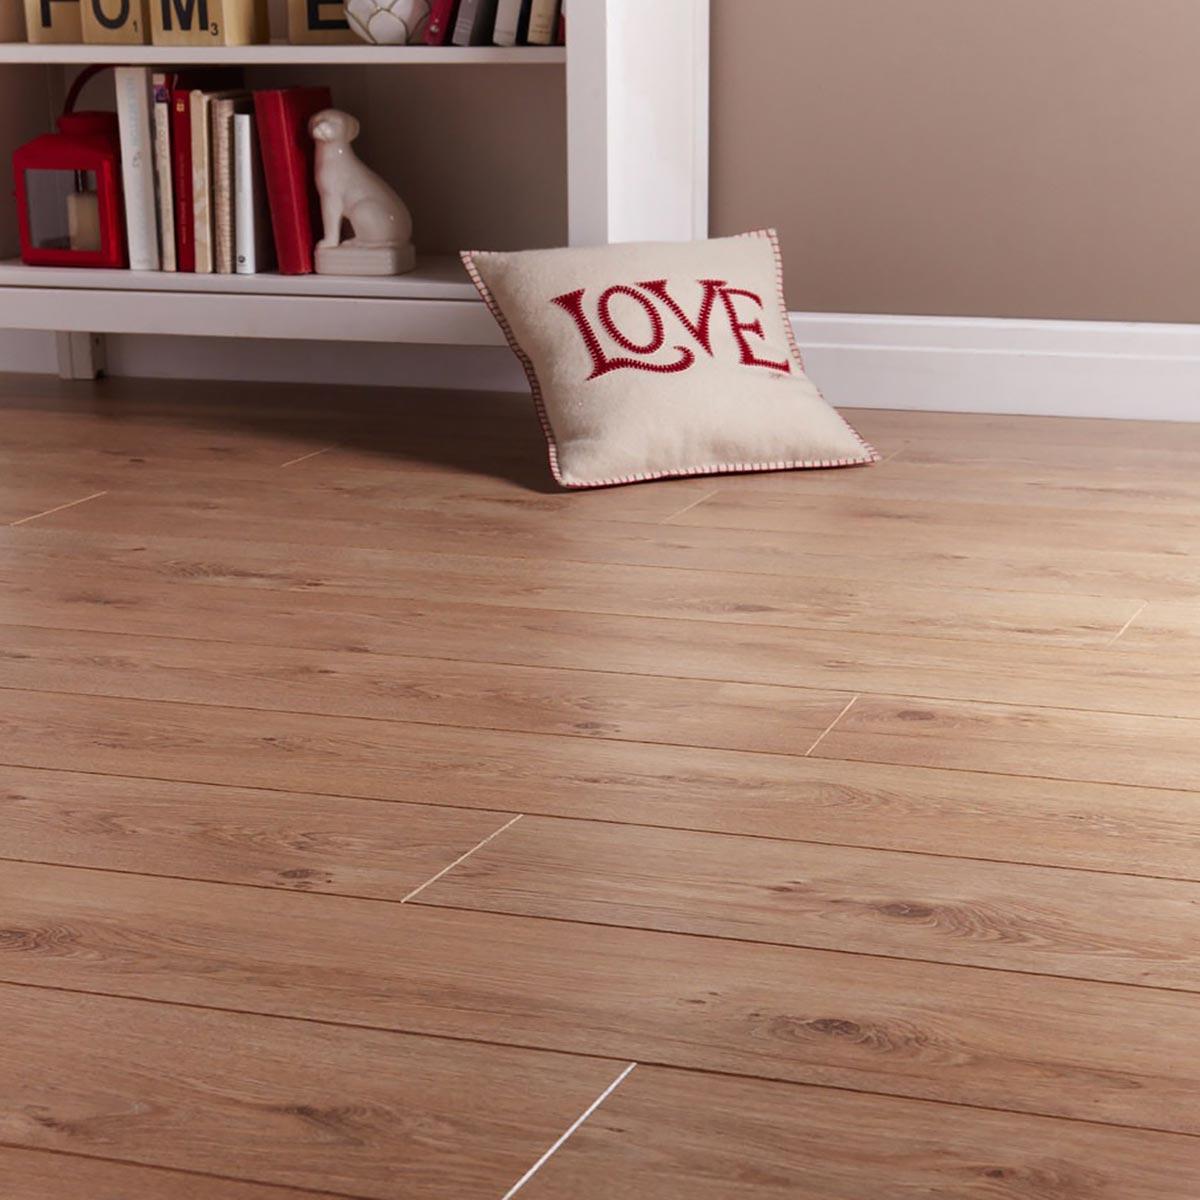 Lifestyle Floors Chelsea Range, Superior Quality Laminate Flooring